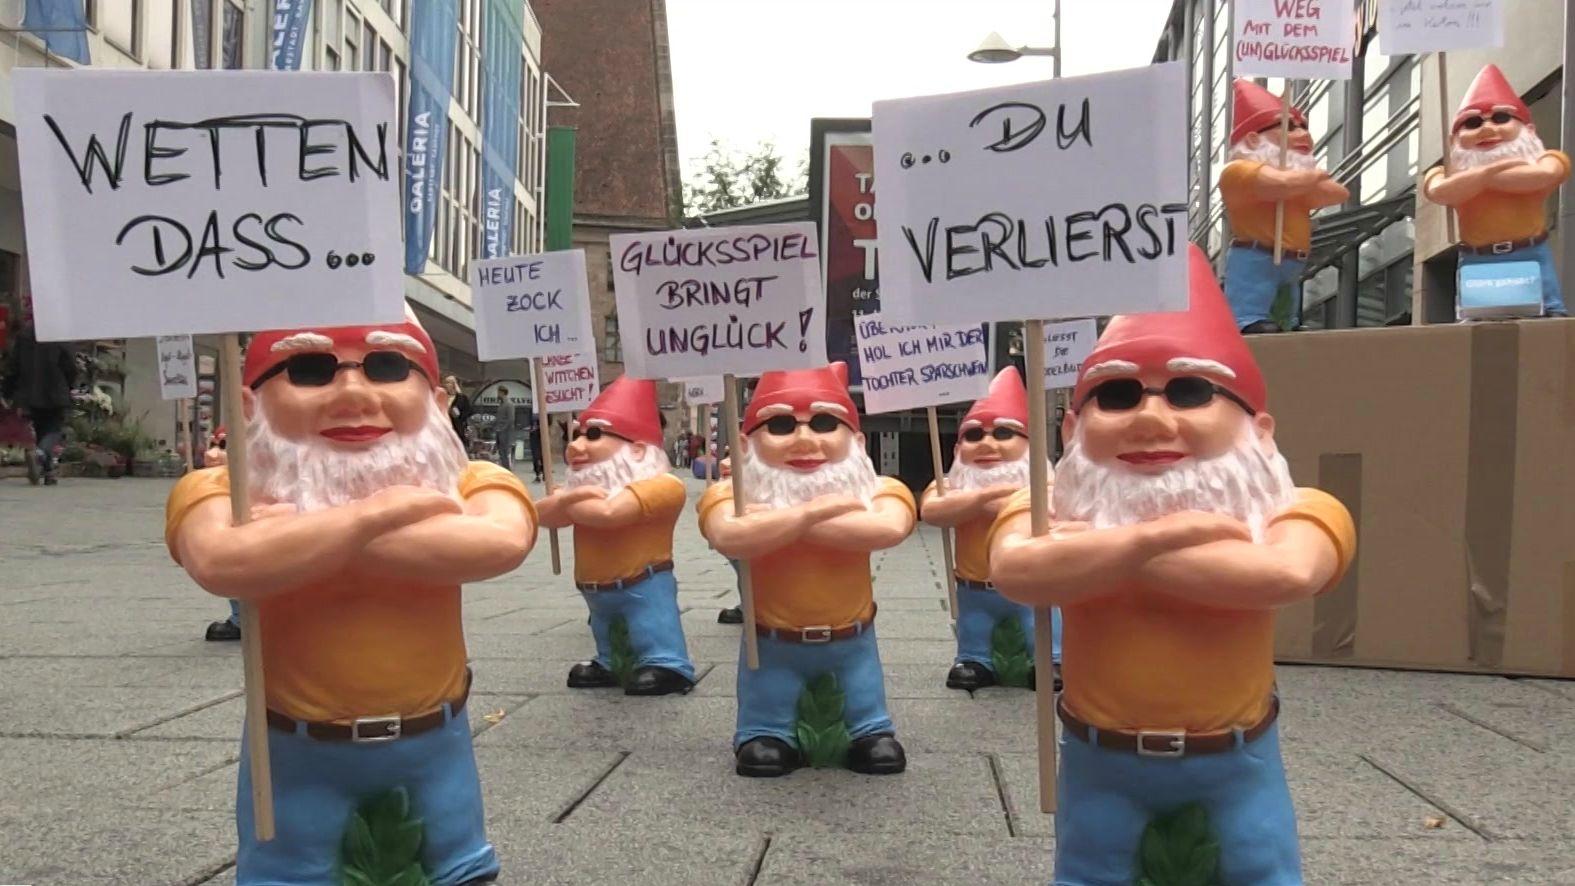 Protest-Zwerge in Nürnberg